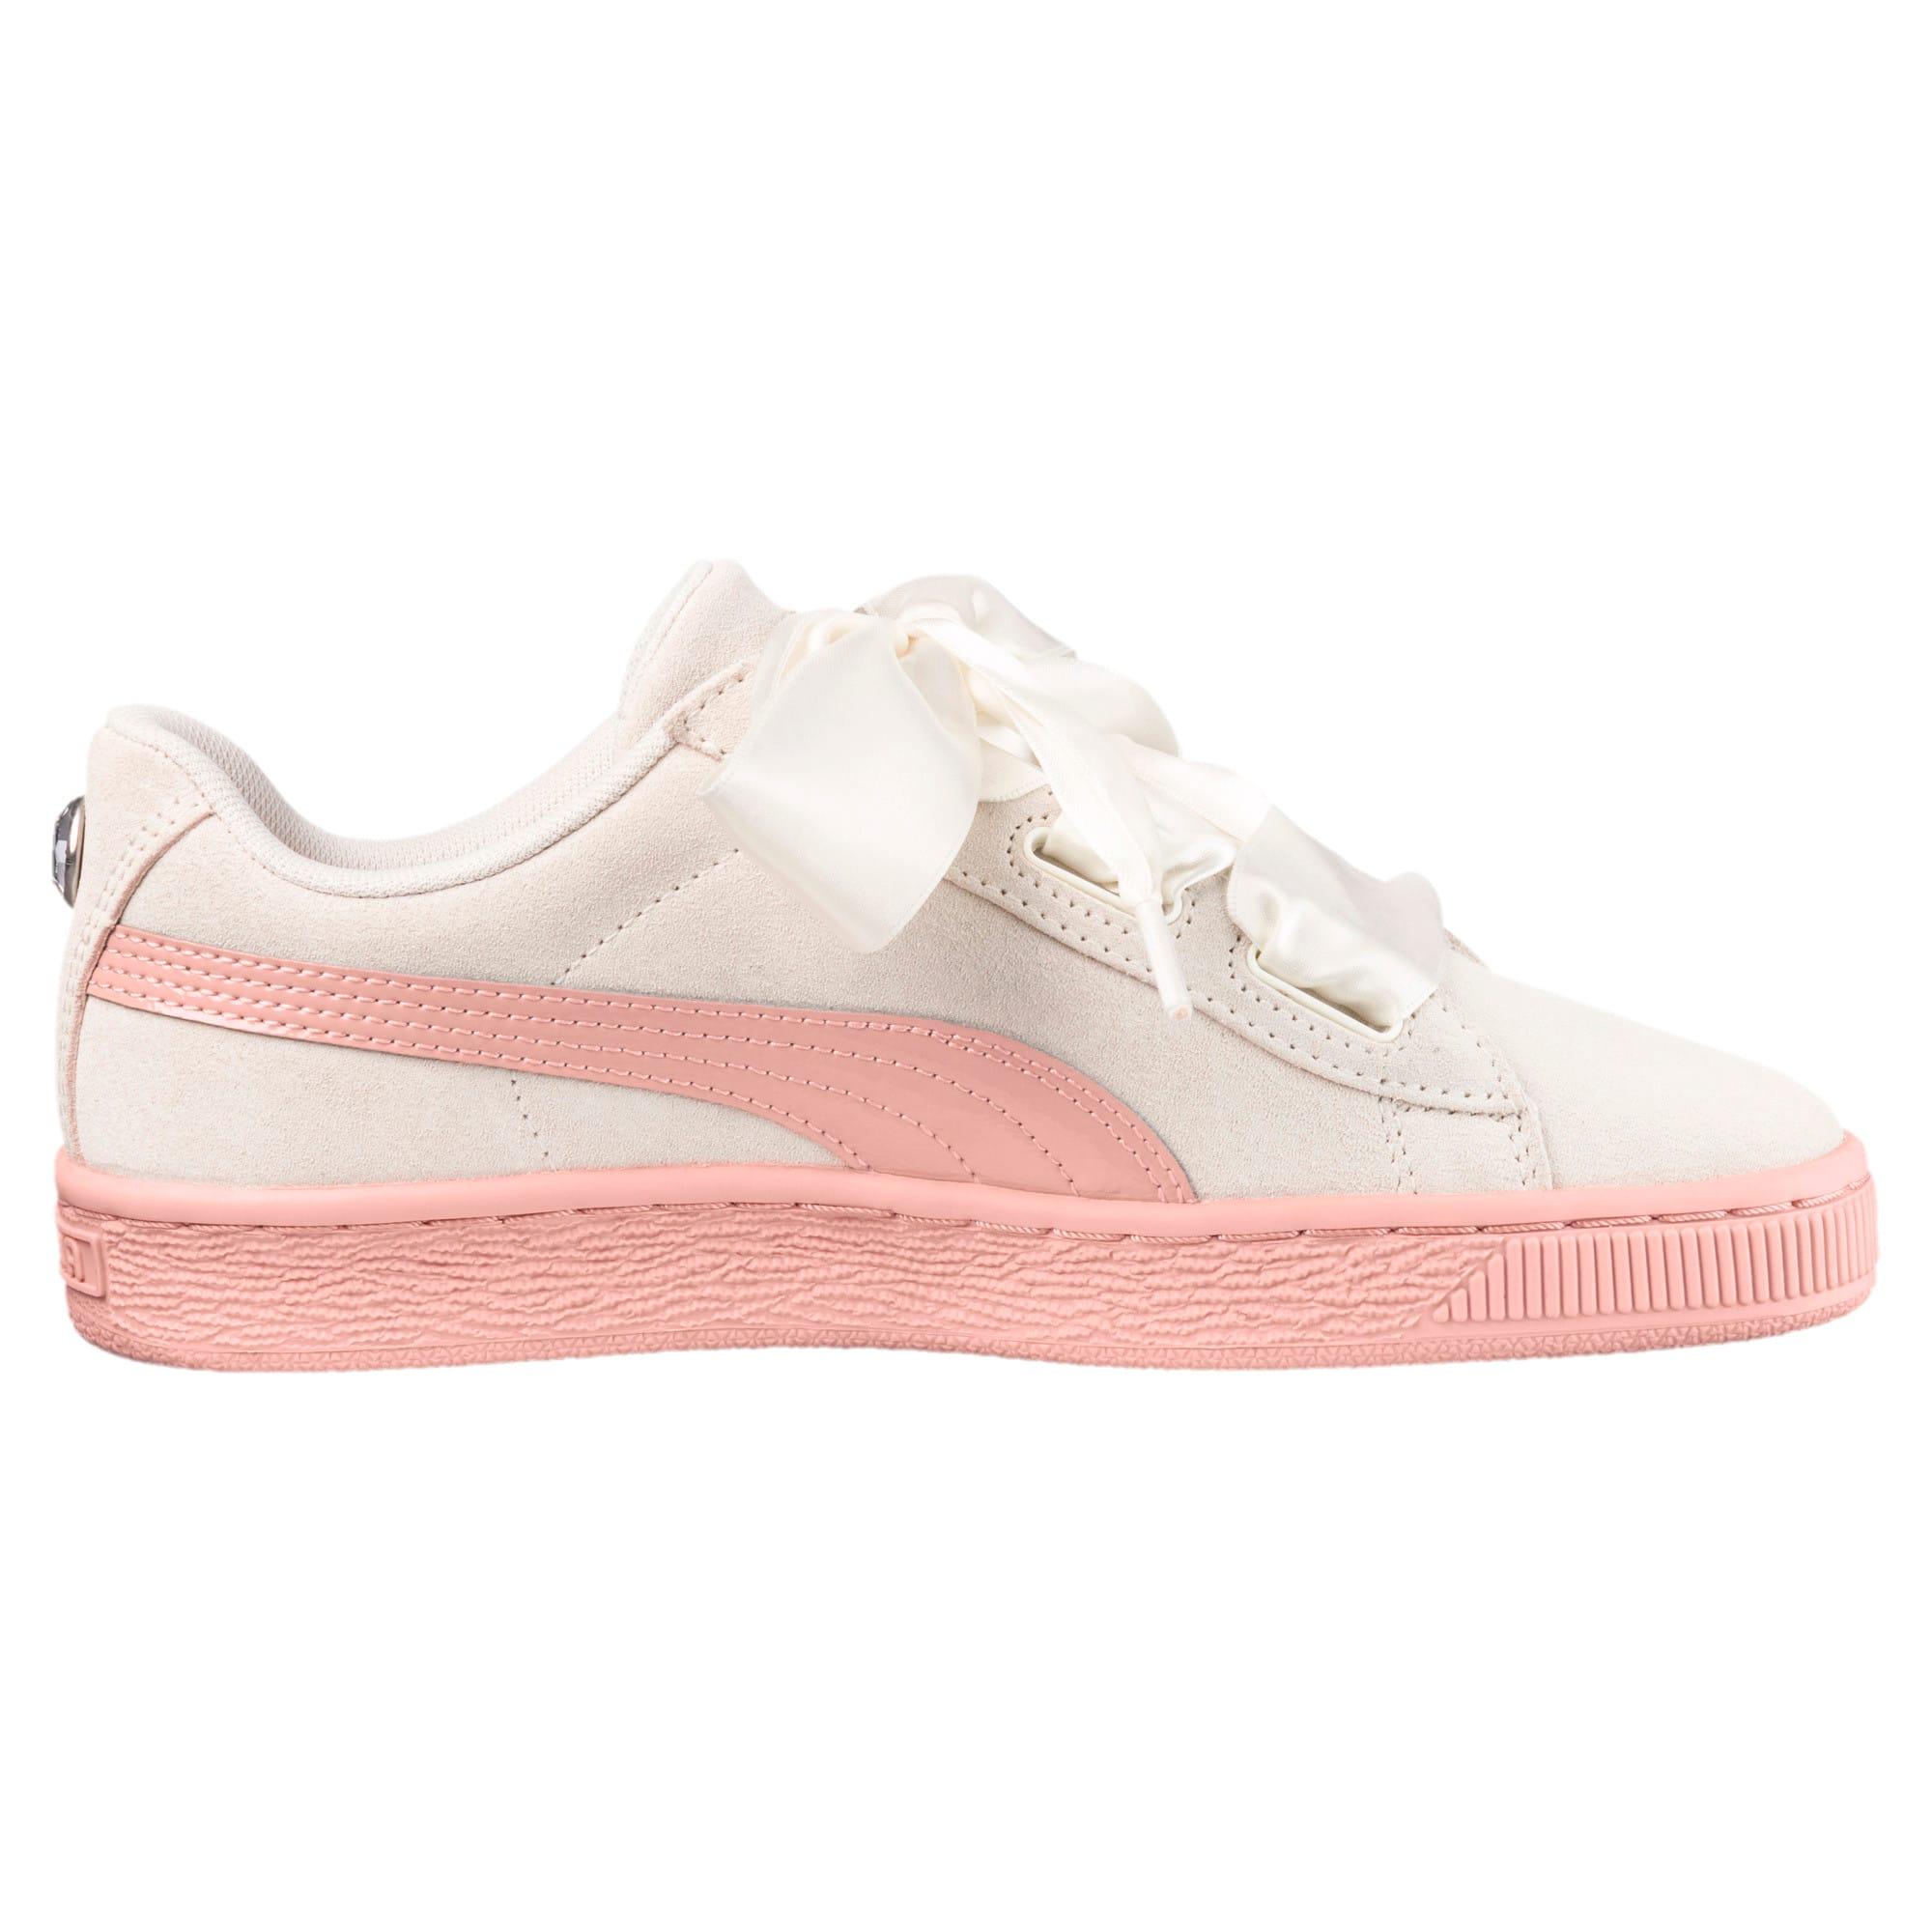 Thumbnail 3 of Suede Heart Jewel Sneakers JR, Whisper White-Peach Beige, medium